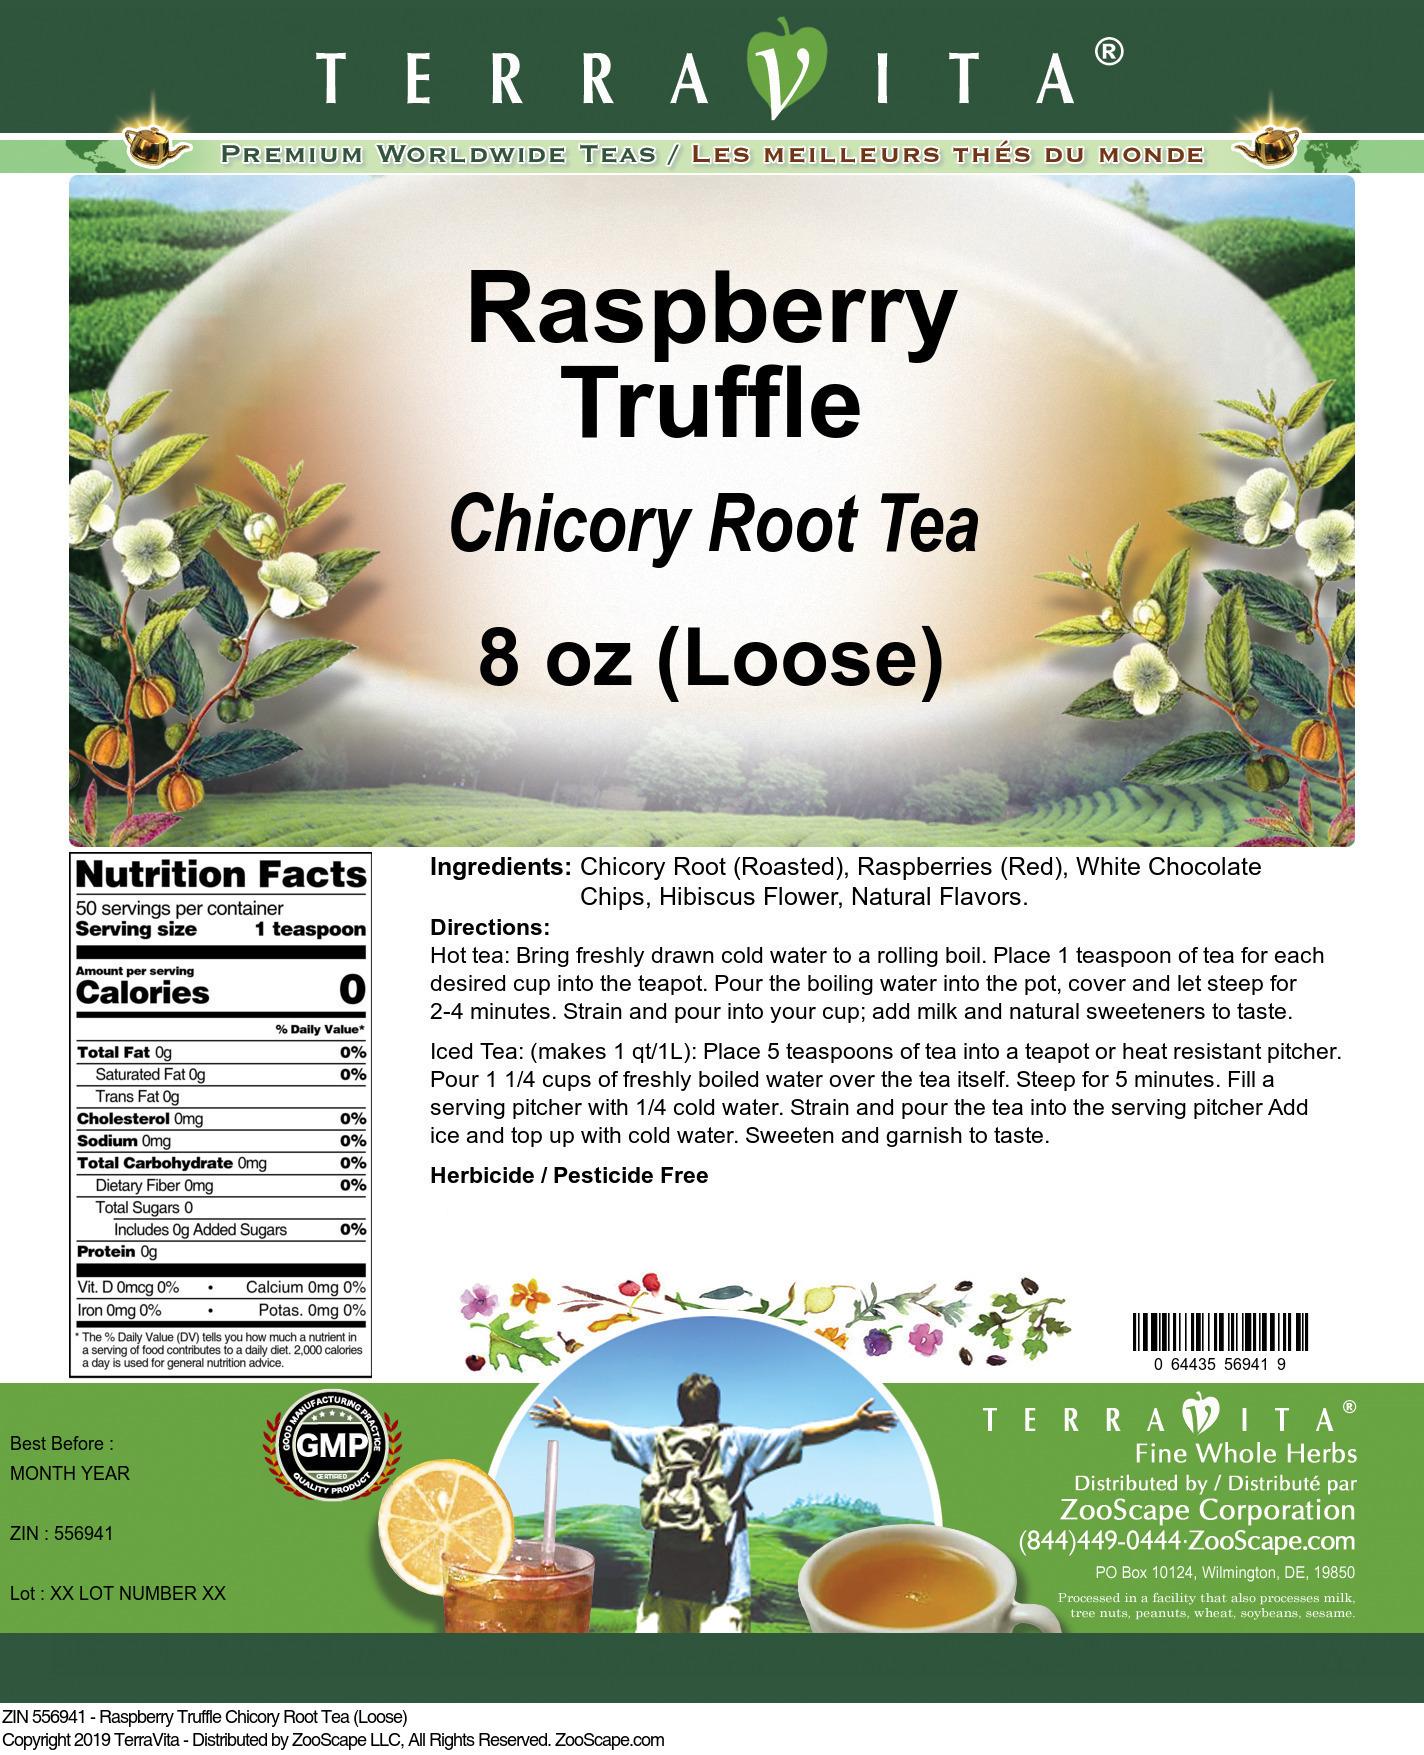 Raspberry Truffle Chicory Root Tea (Loose)